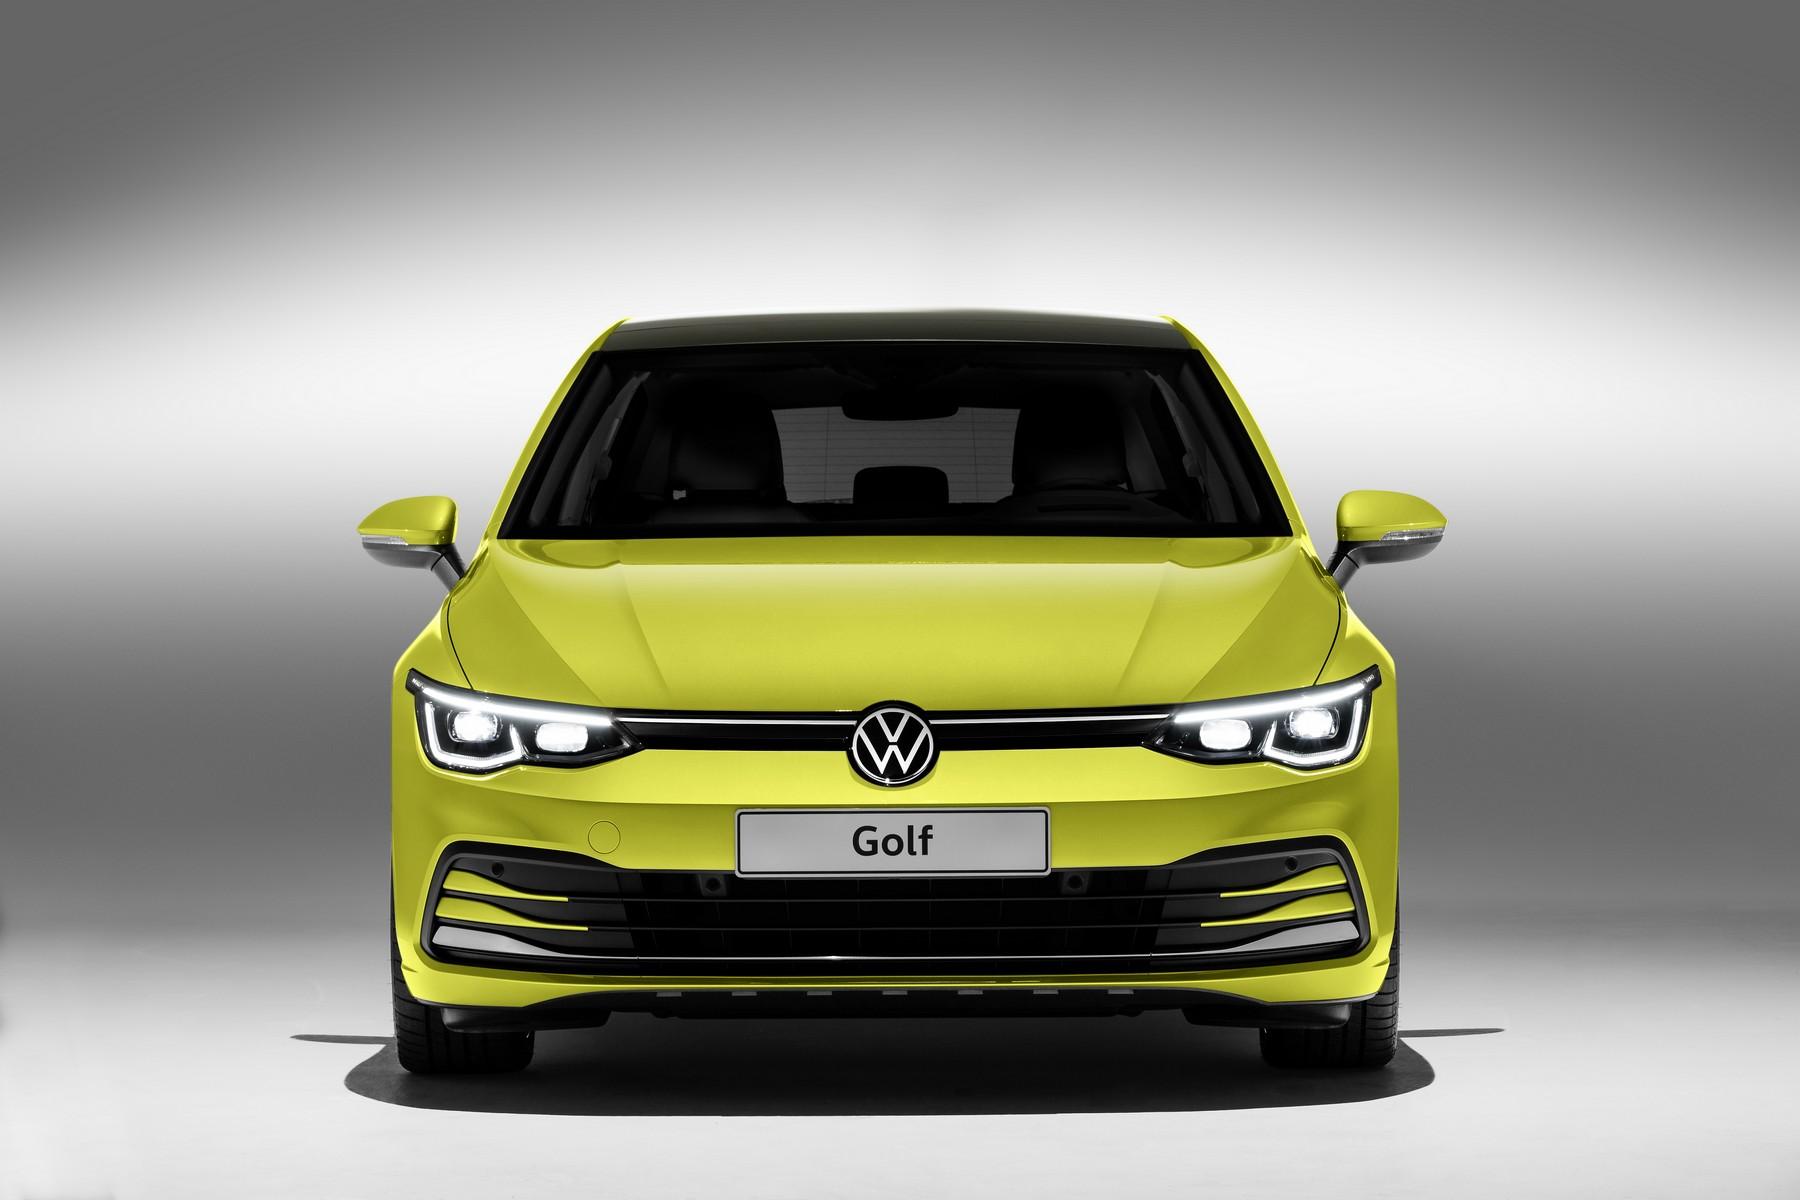 VW-Golf-8-11